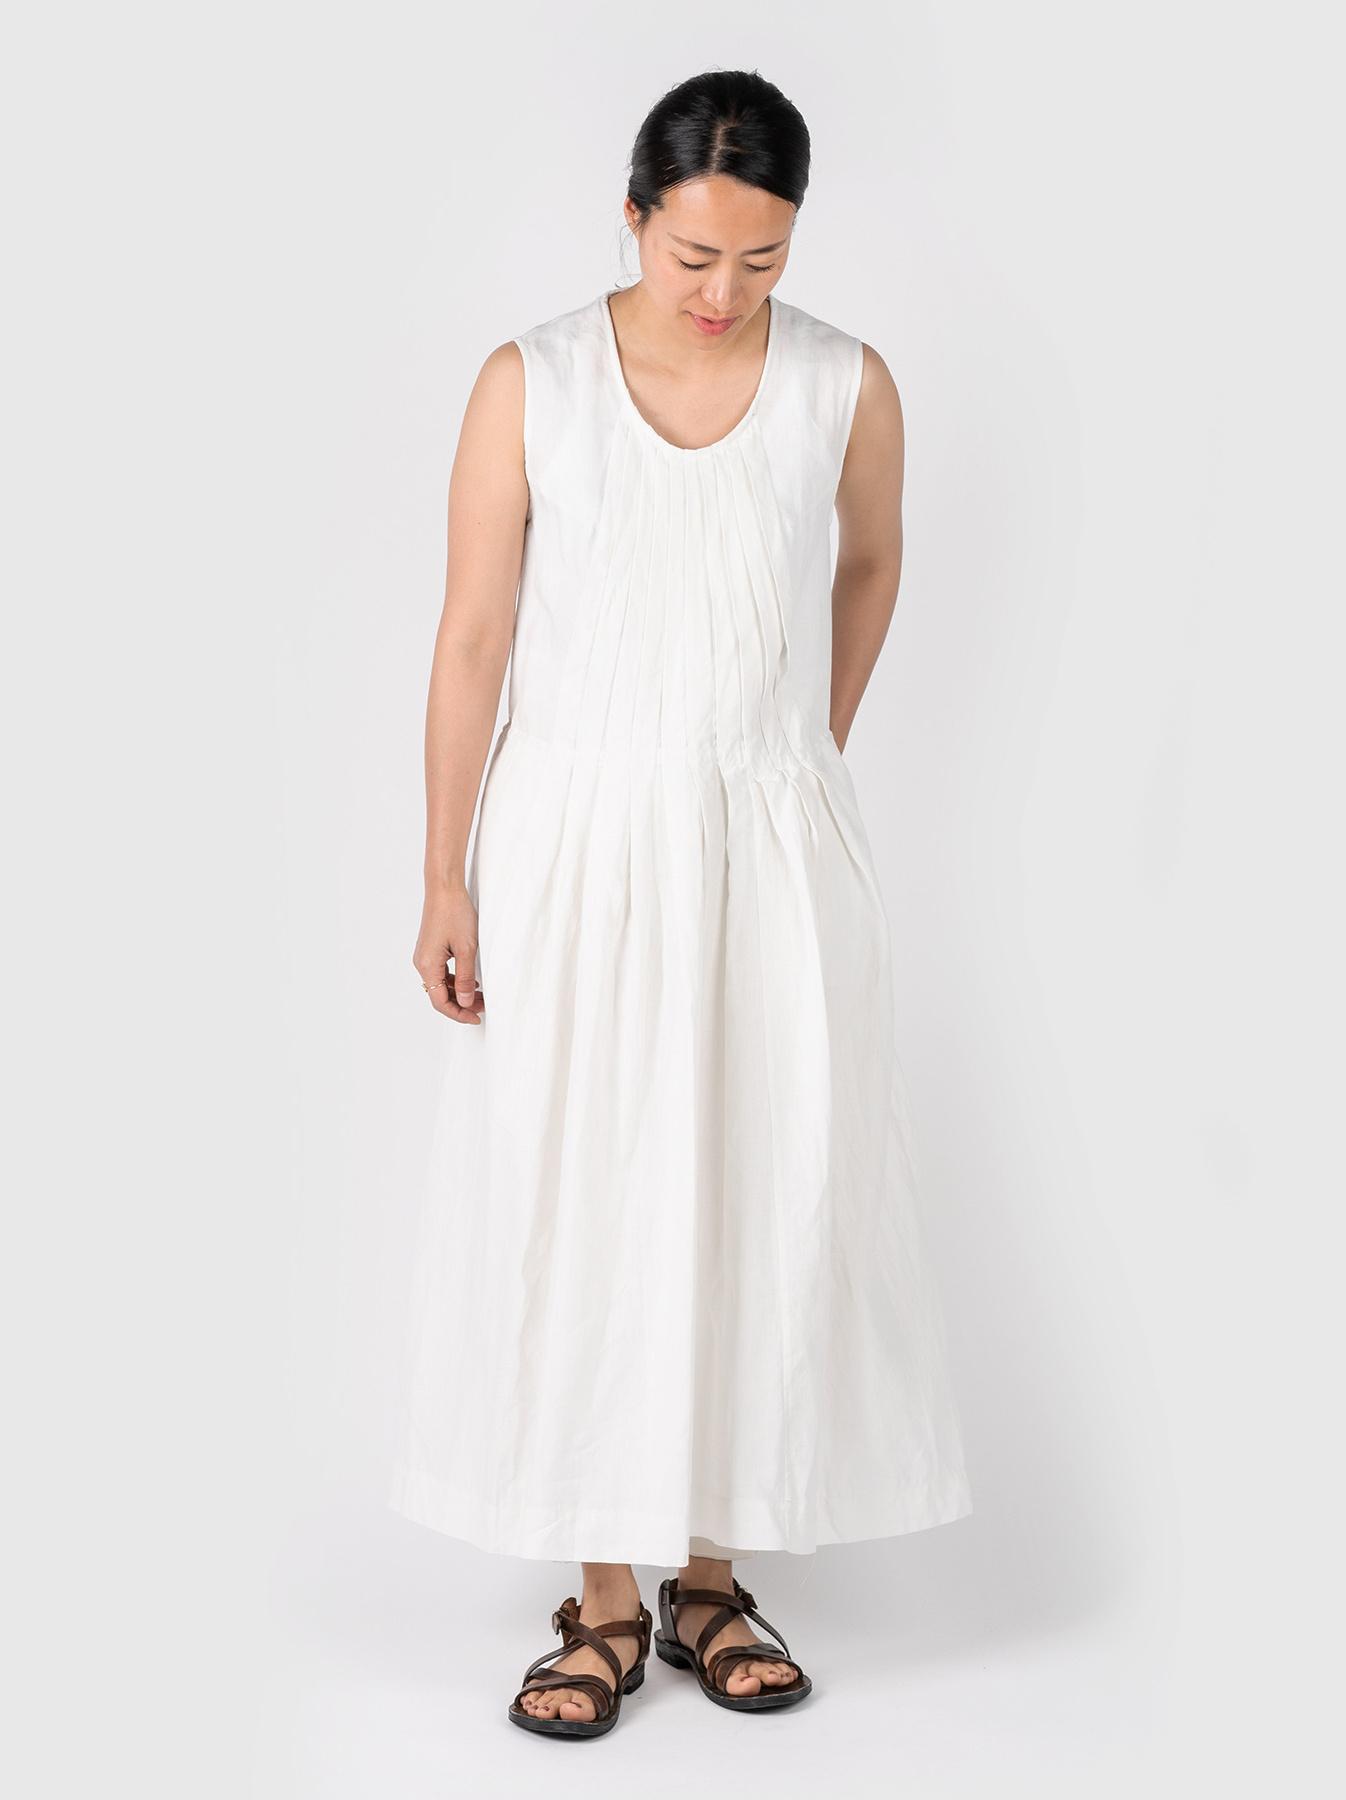 WH Linen Sleeveless Tuck Dress-2